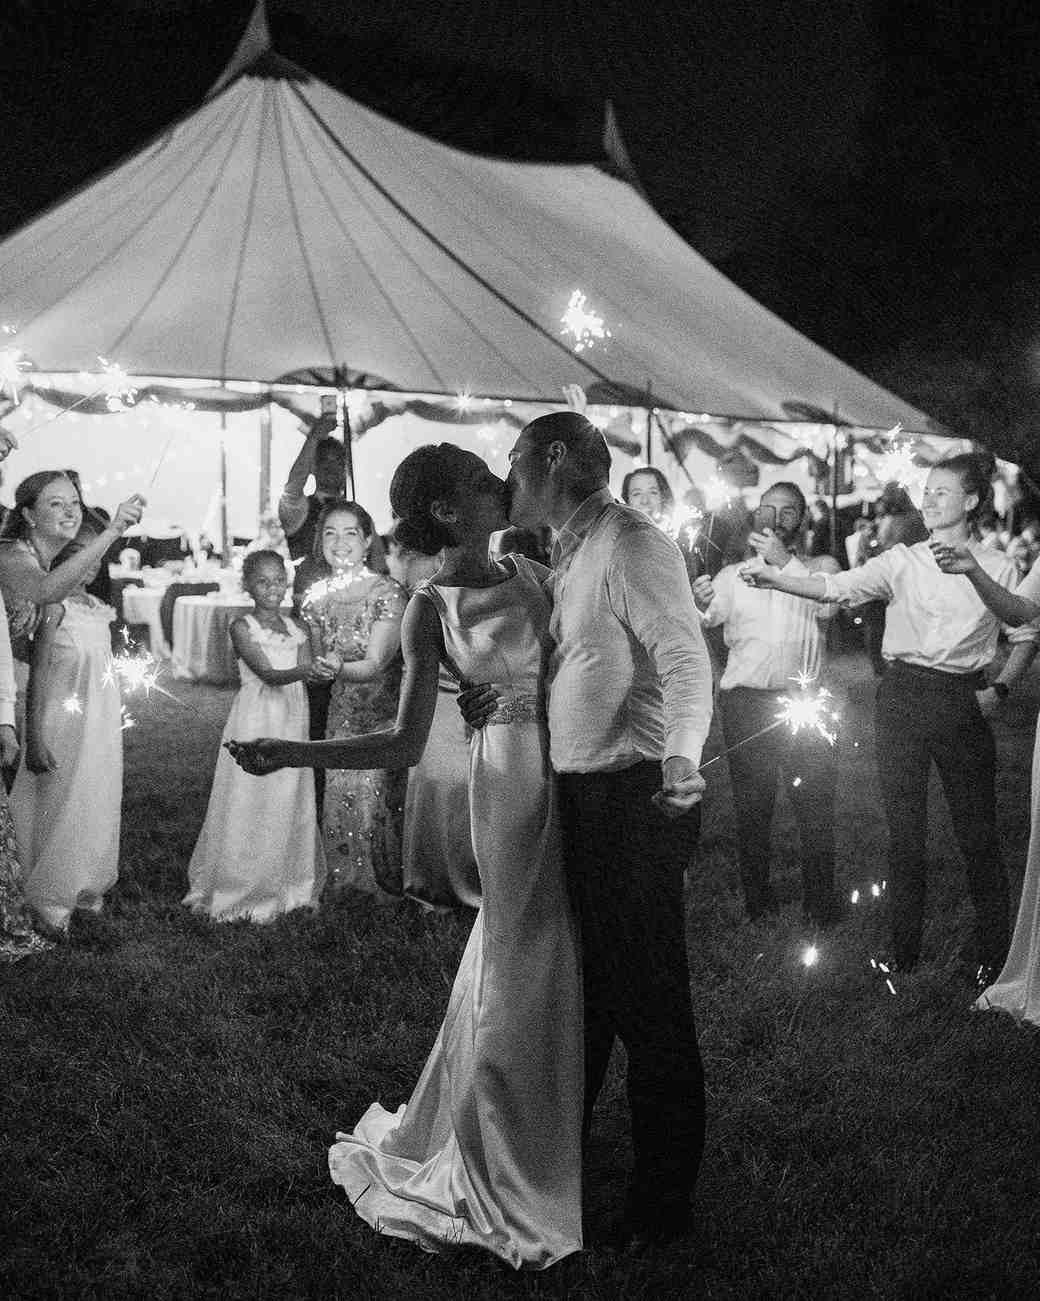 pillar paul wedding sparklers couple kissing